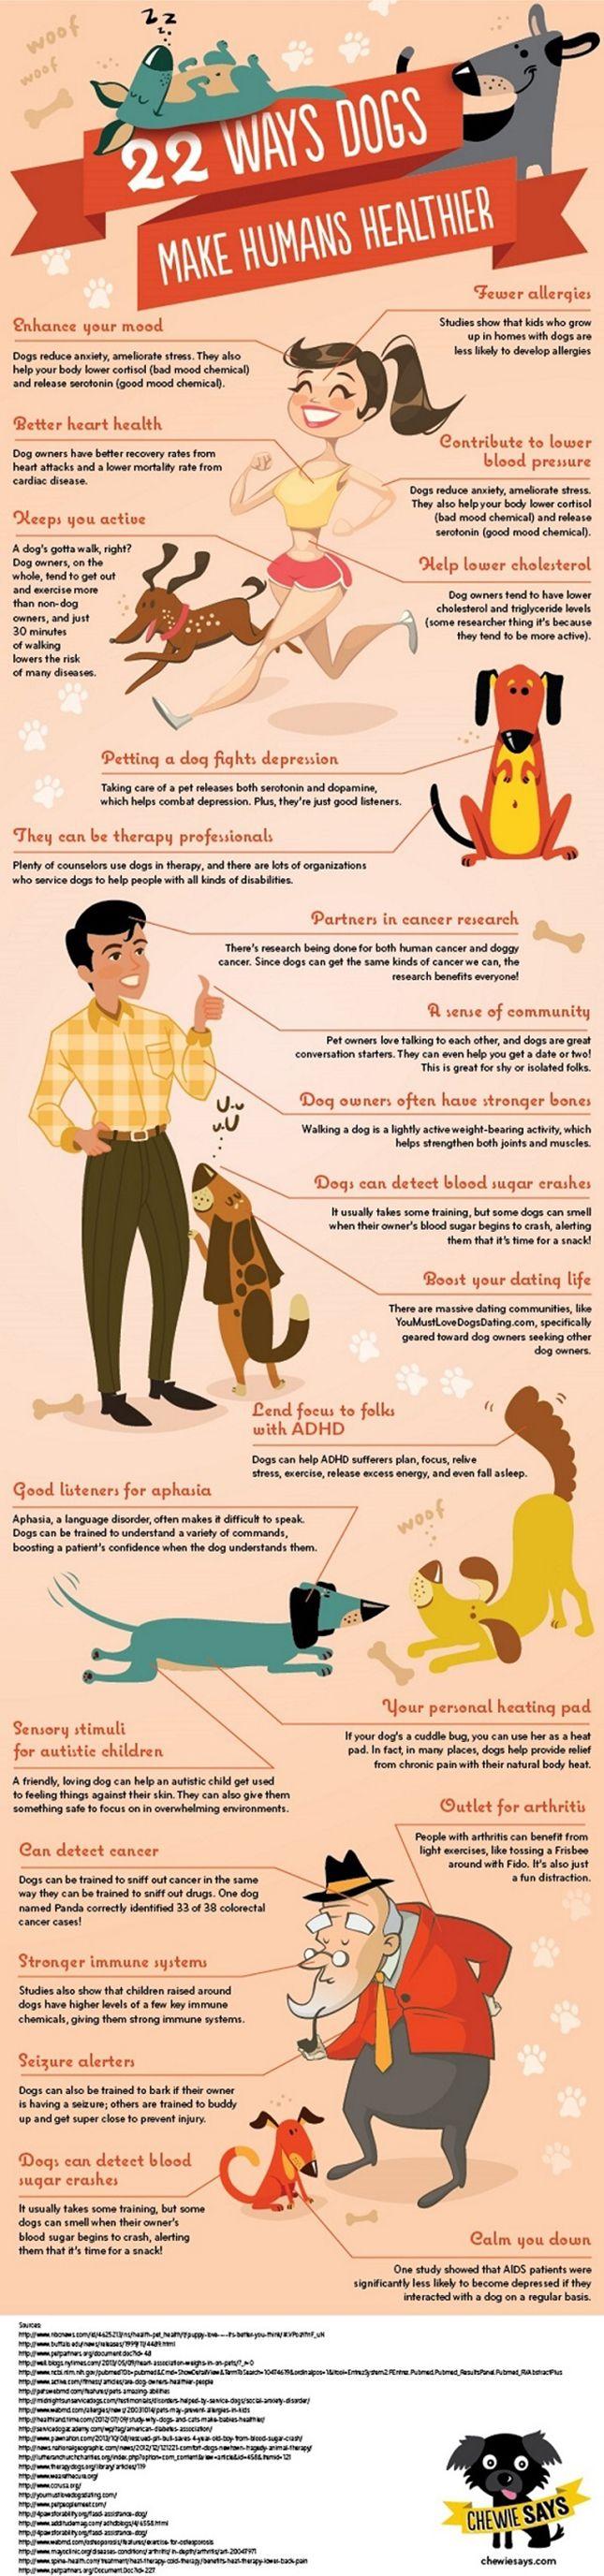 22 Ways Dogs Make Humans Healthier via Brit + Co.